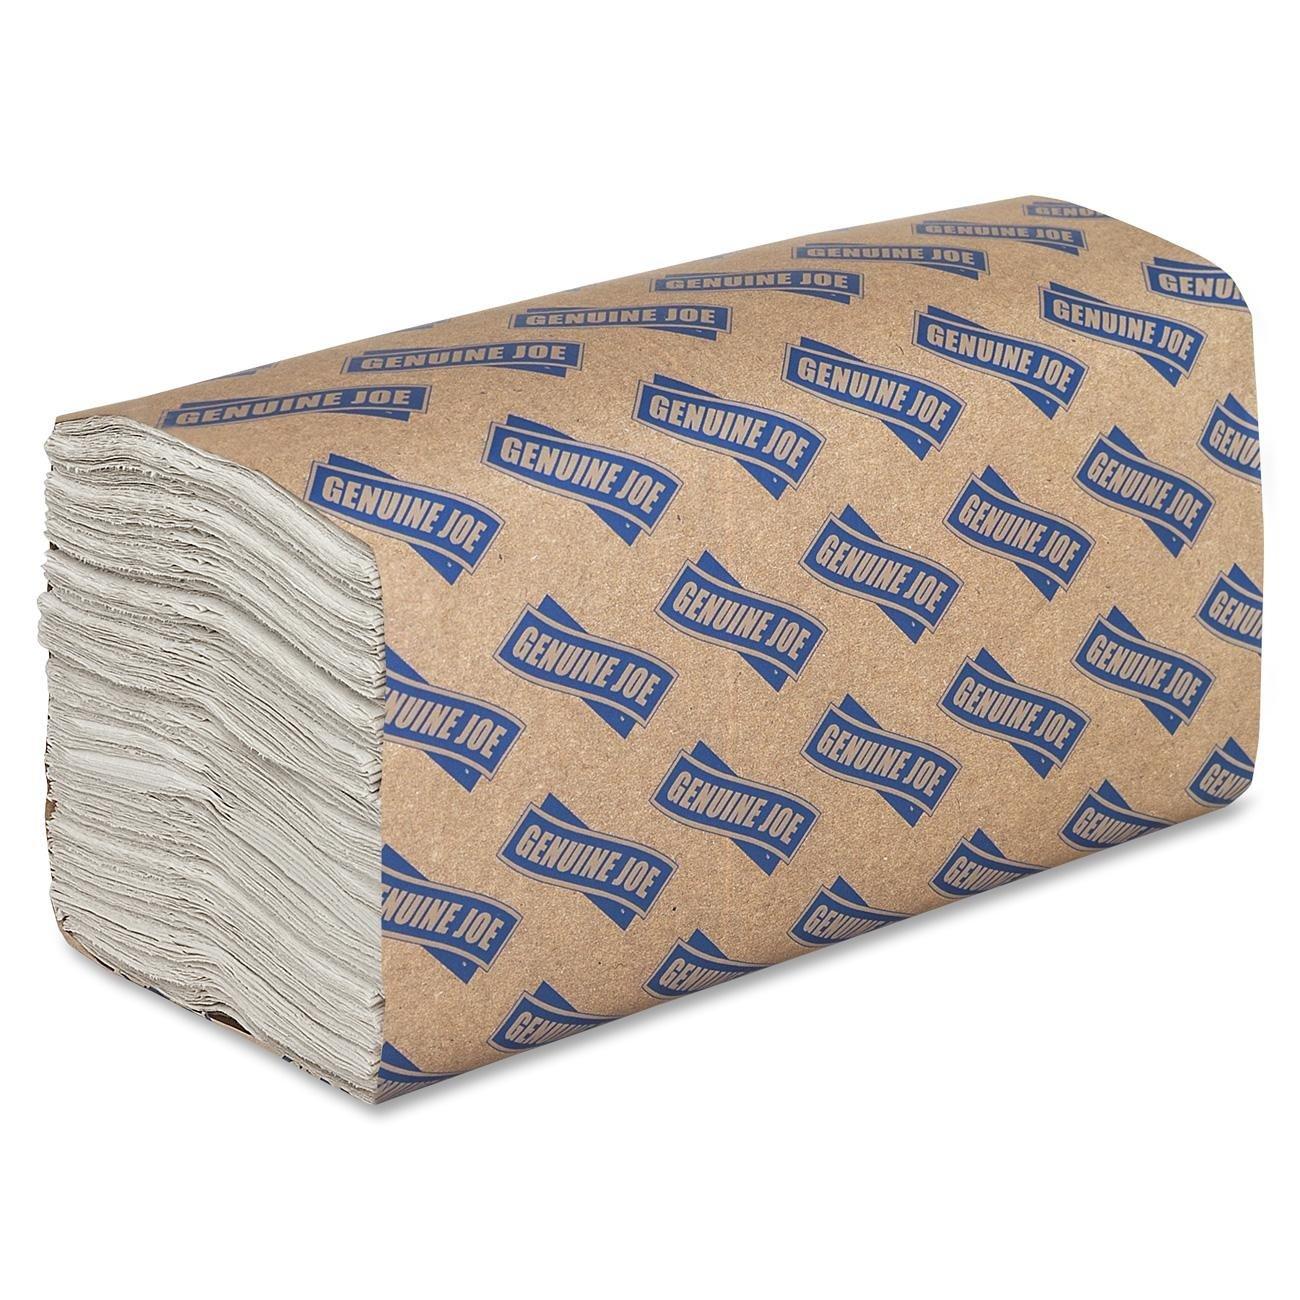 Genuine Joe GJO21120 C-Fold Towels- 1-Ply- 13in.x10-.13in.- 2400 Towels-CT- White B002Q3TYA6  1